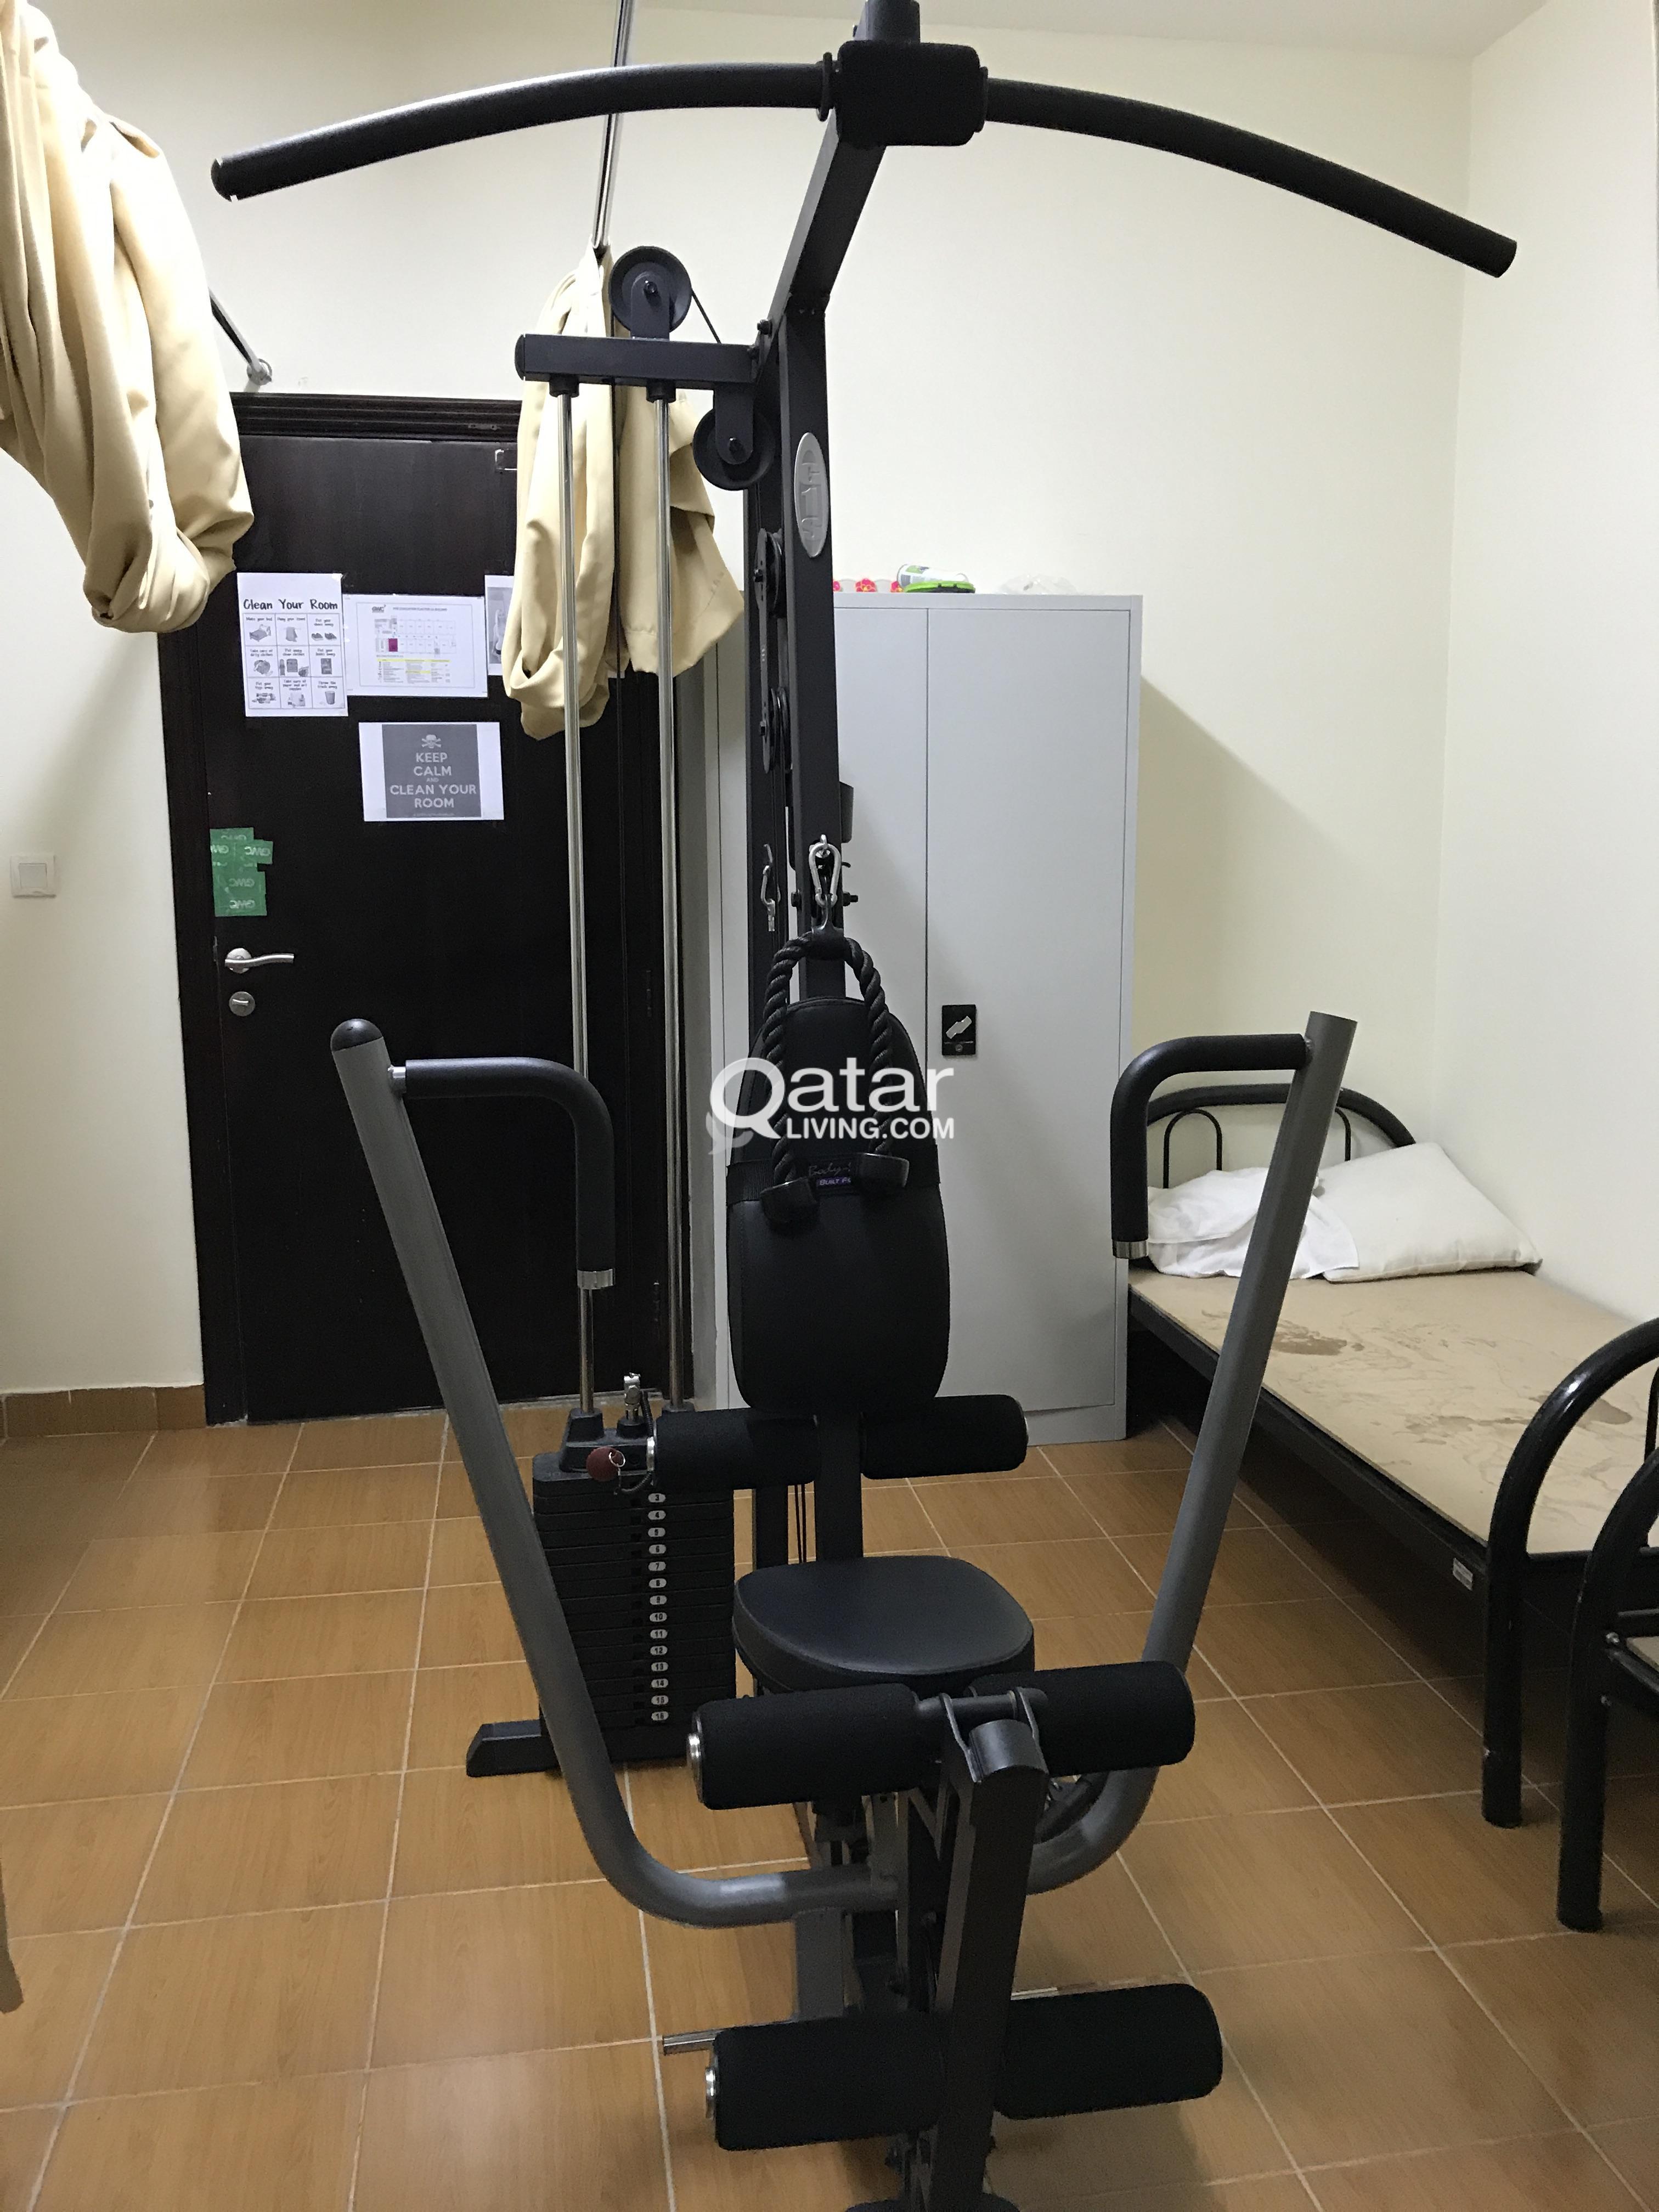 Body solid home gym qatar living